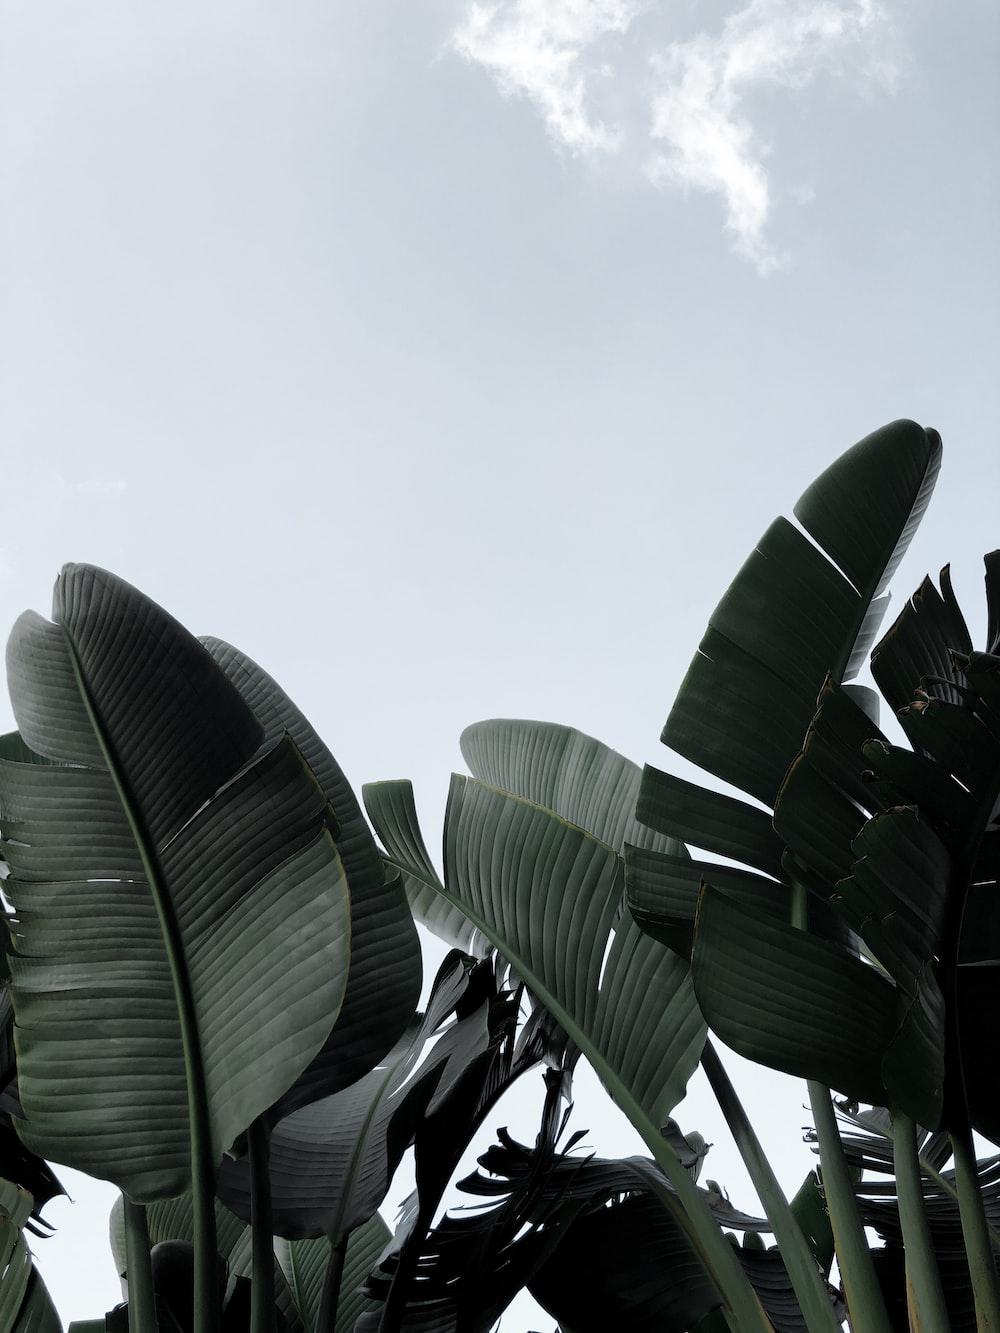 grayscale photo of banana